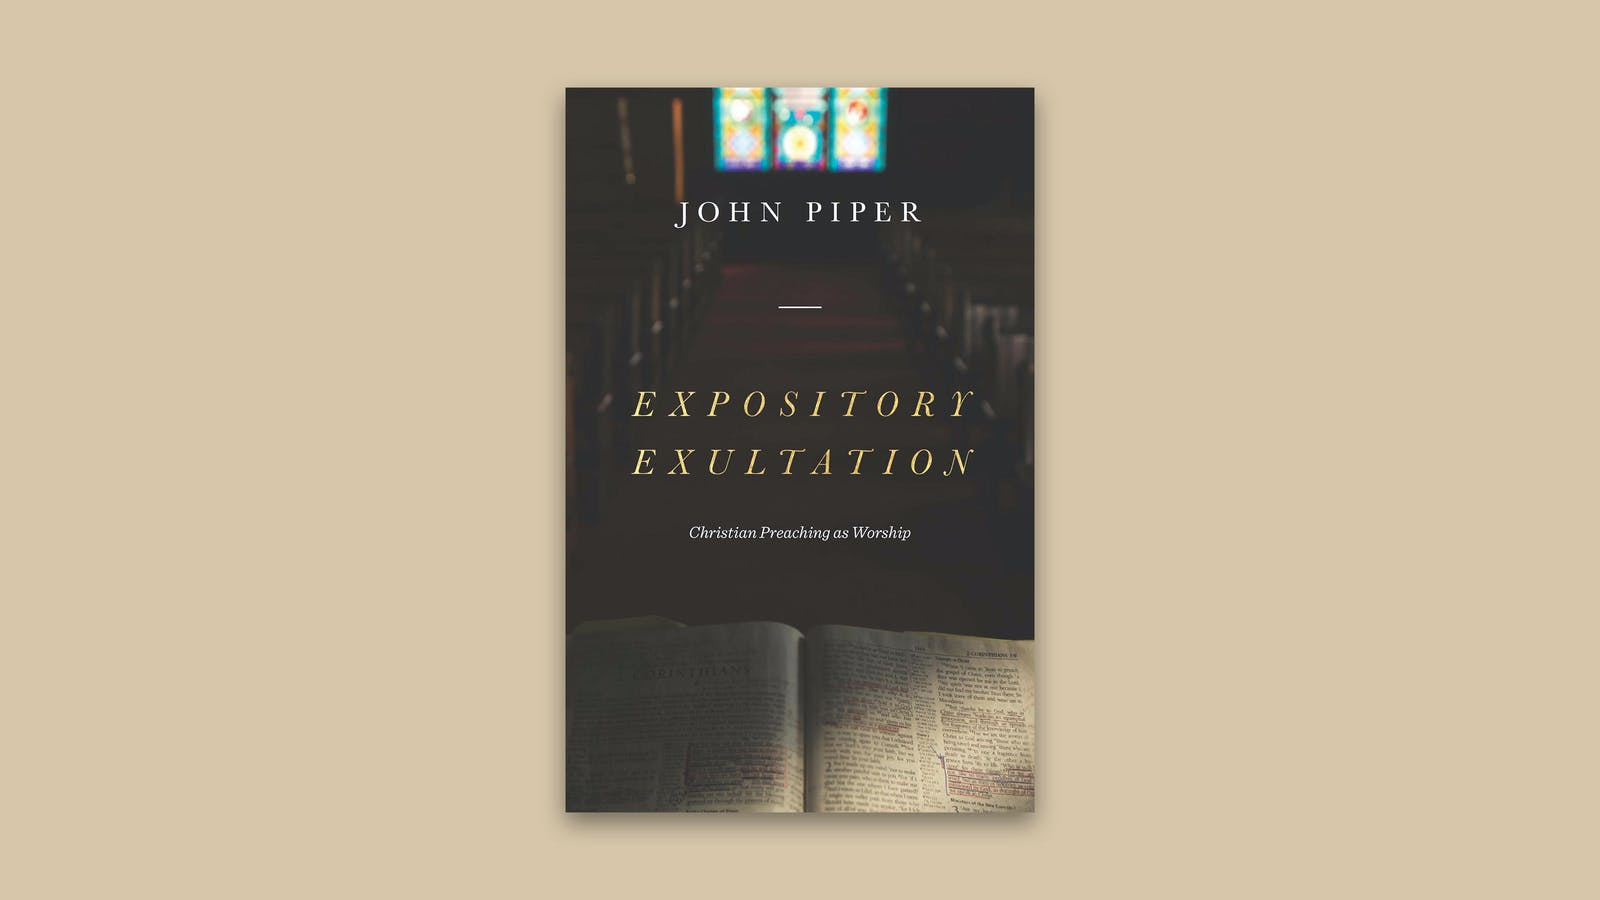 Expository Exultation: Christian Preaching as Worship | Desiring God